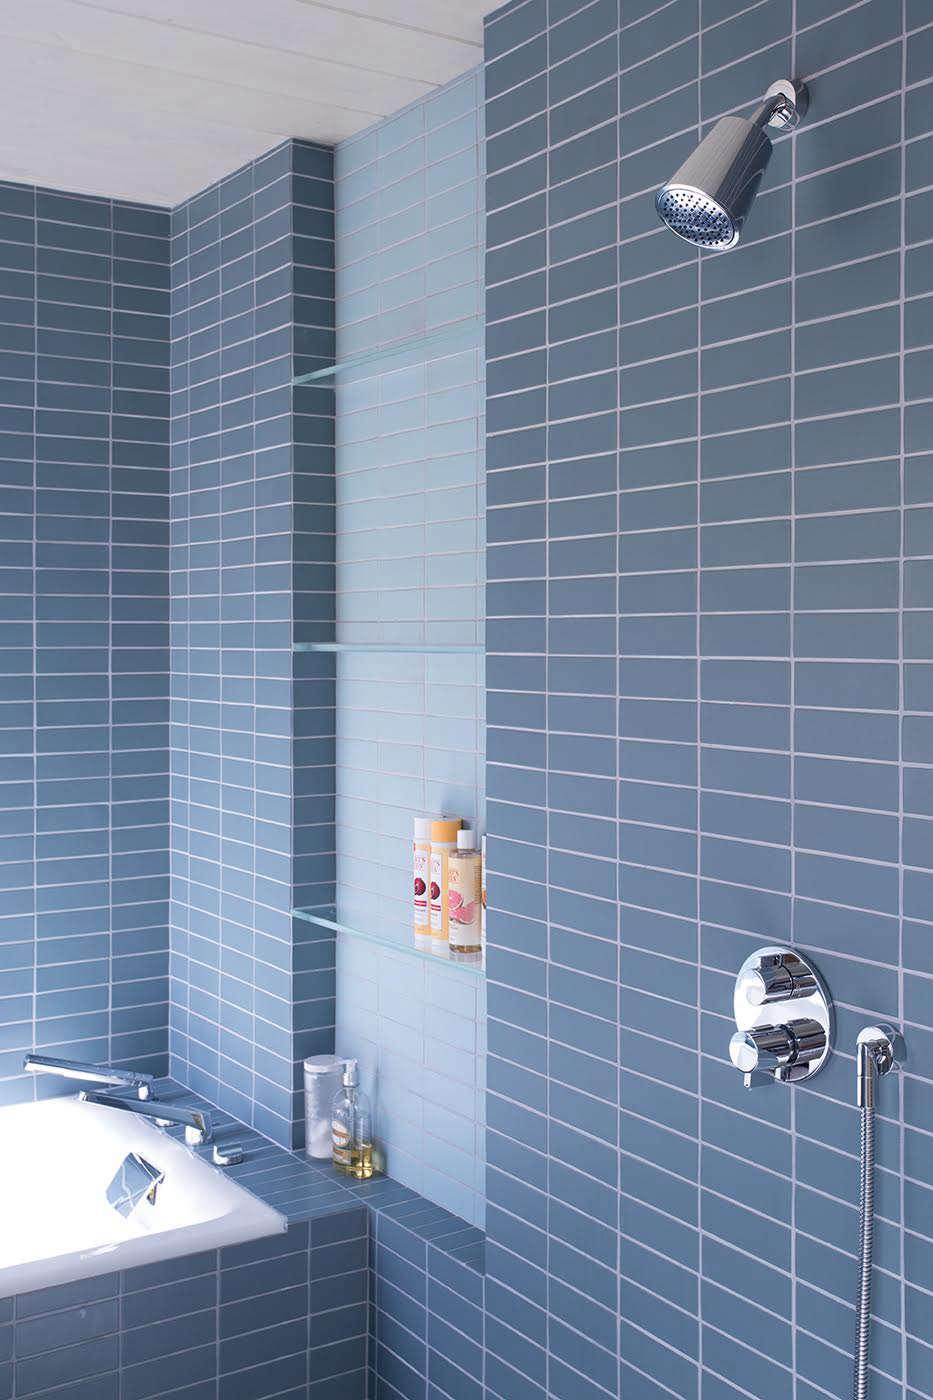 Klopf-Architecture-Blue-Tile-White-Grout-Remodelista-1